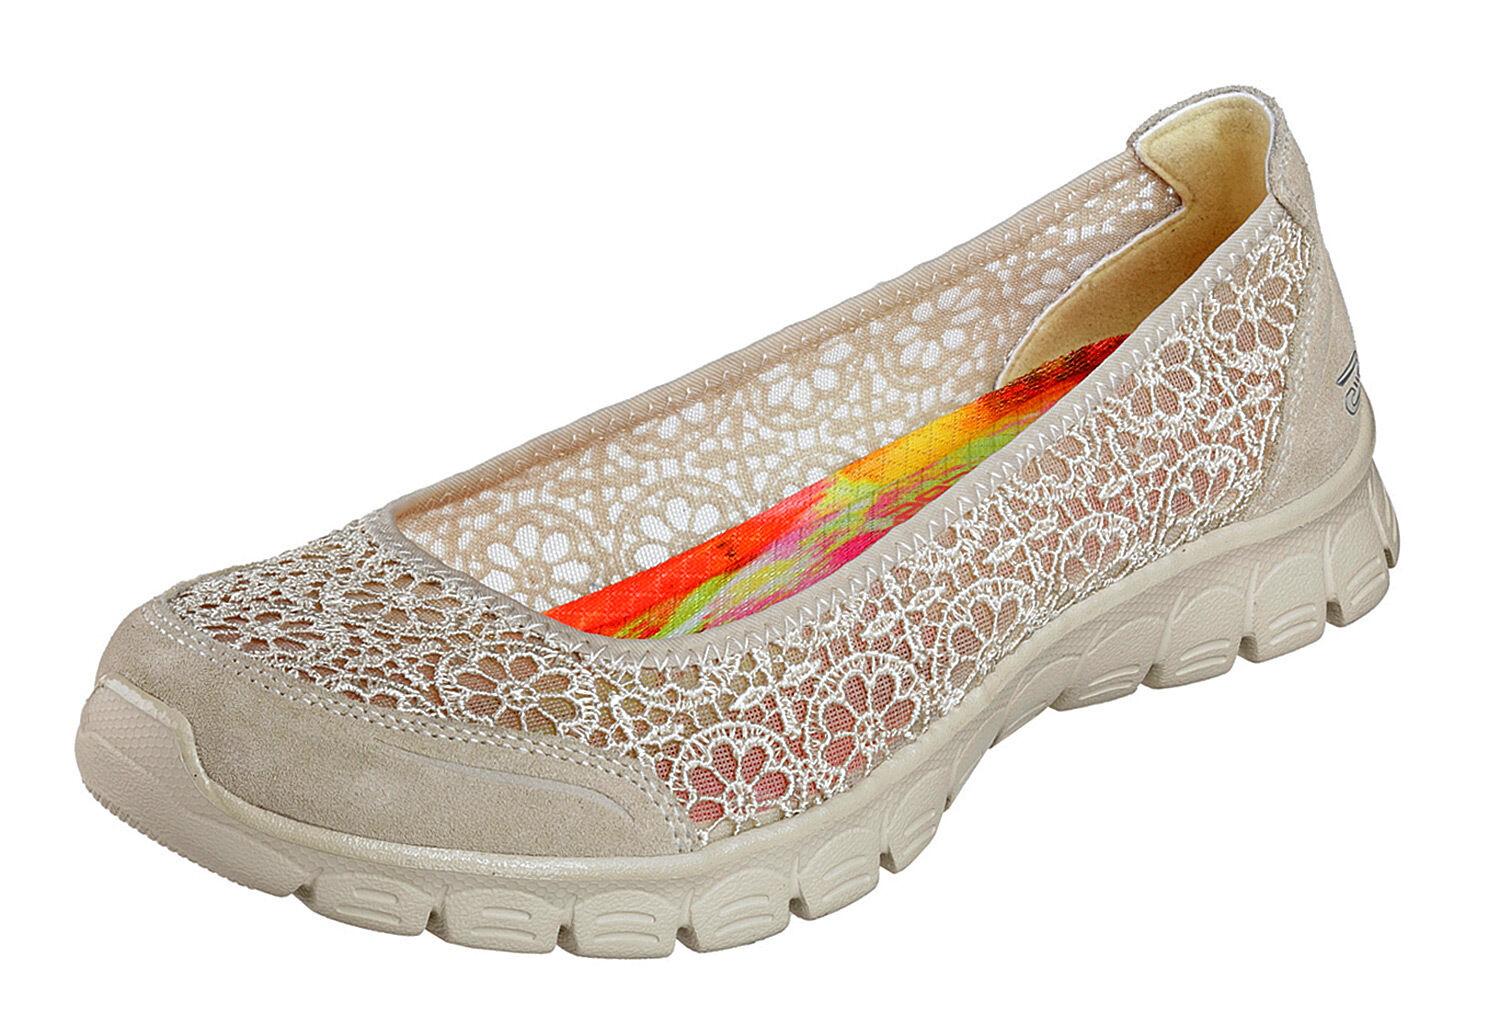 Skechers NEW EZ Flex 3.0 Majesty comfort natural floral memory foam comfort Majesty schuhe sz 3-8 099c27